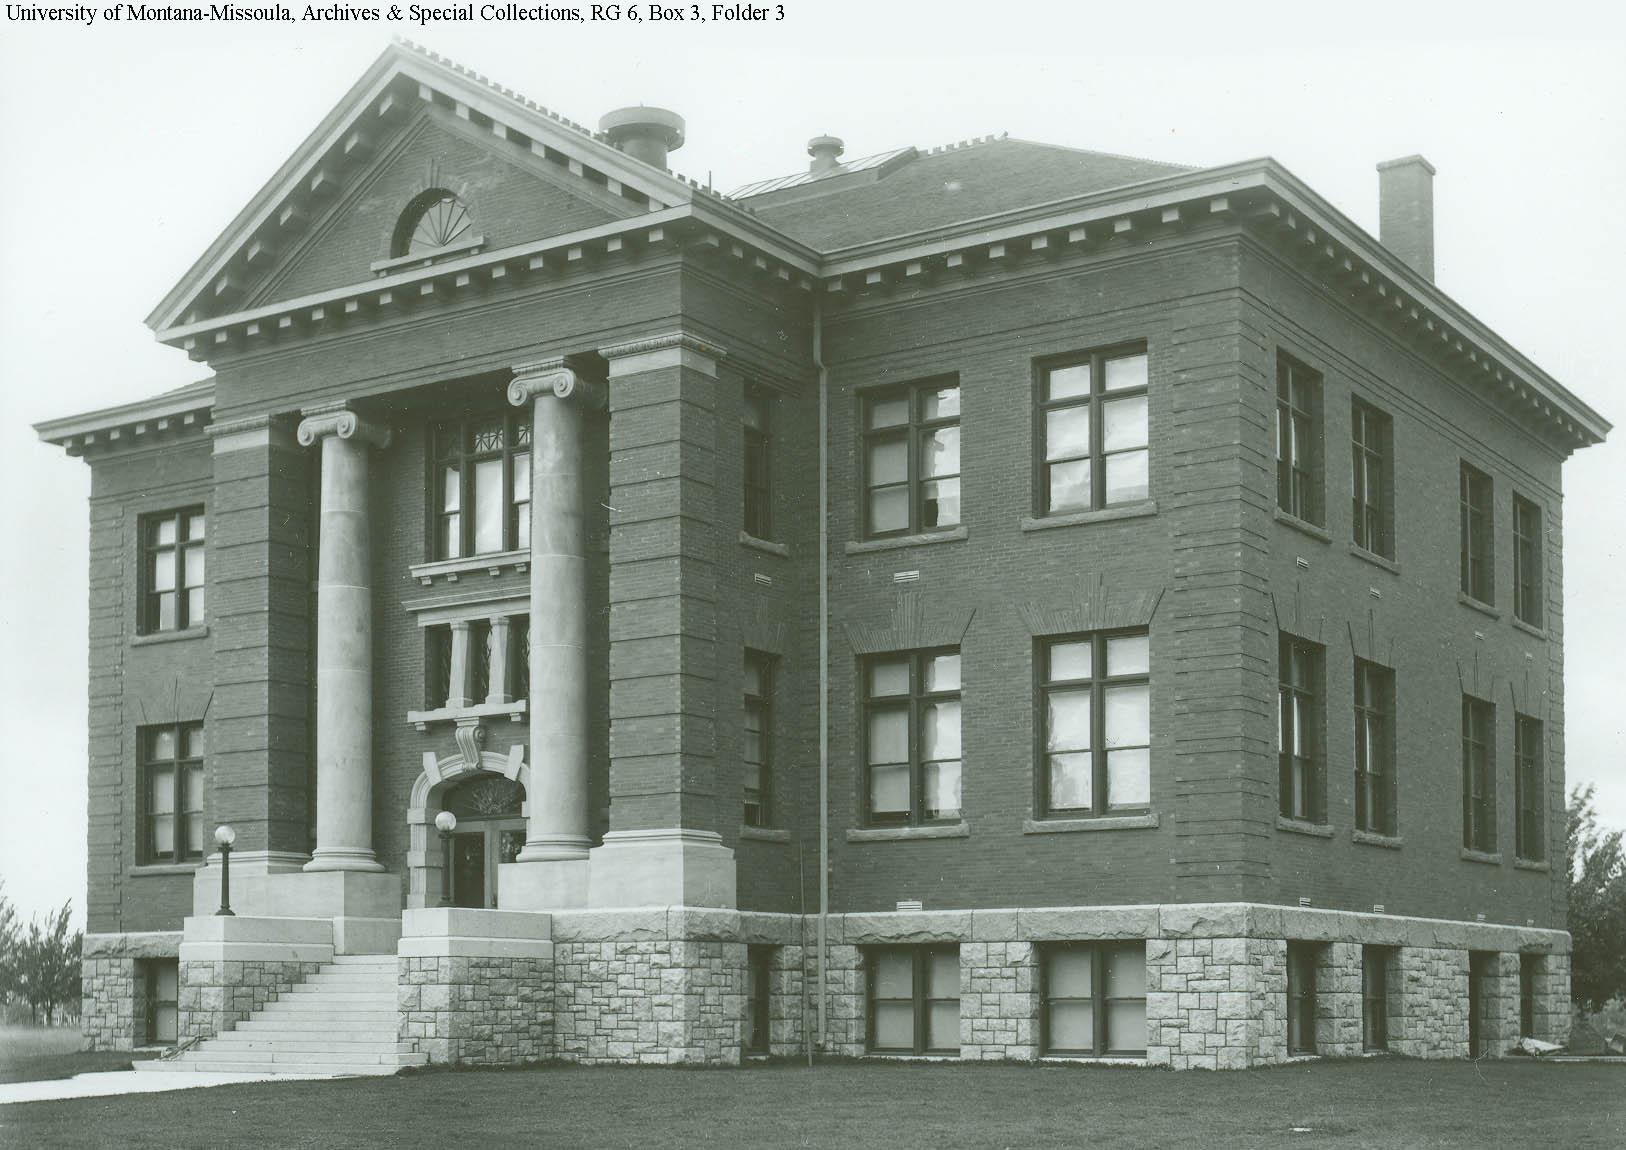 Jeannette Rankin Hall